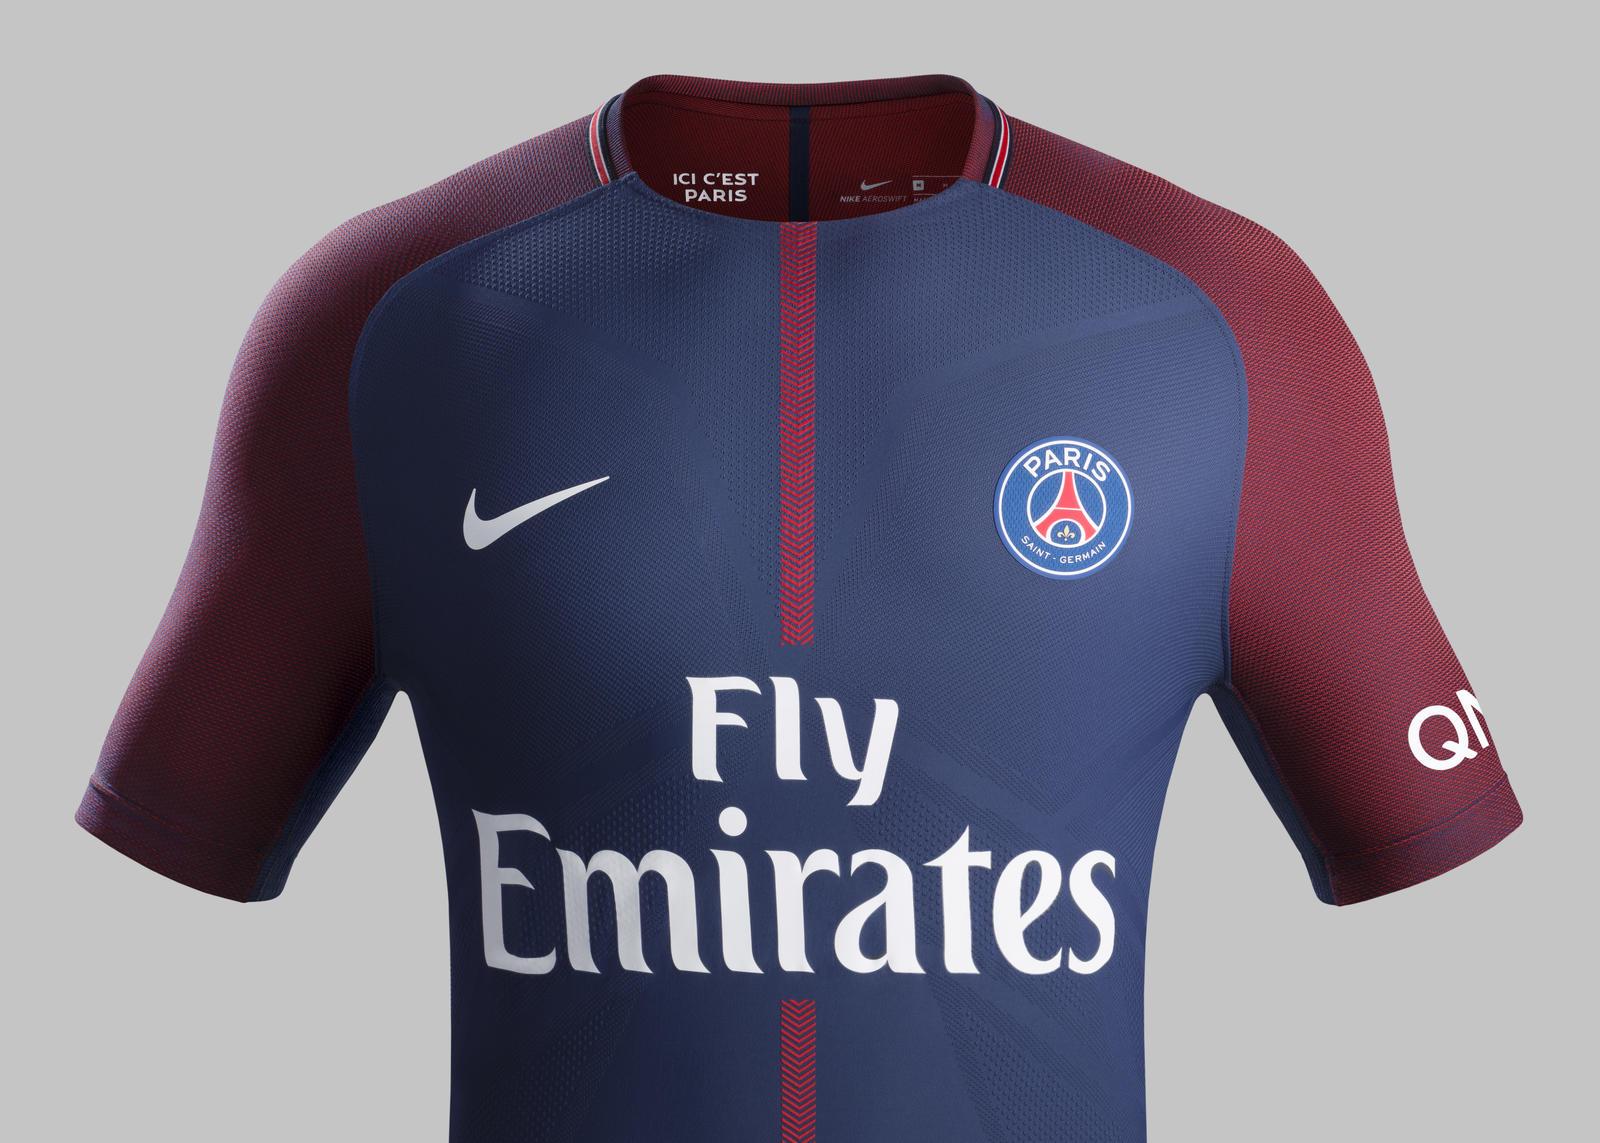 d4929a4a515 Paris Saint-Germain Home Kit 2017-18 - Nike News